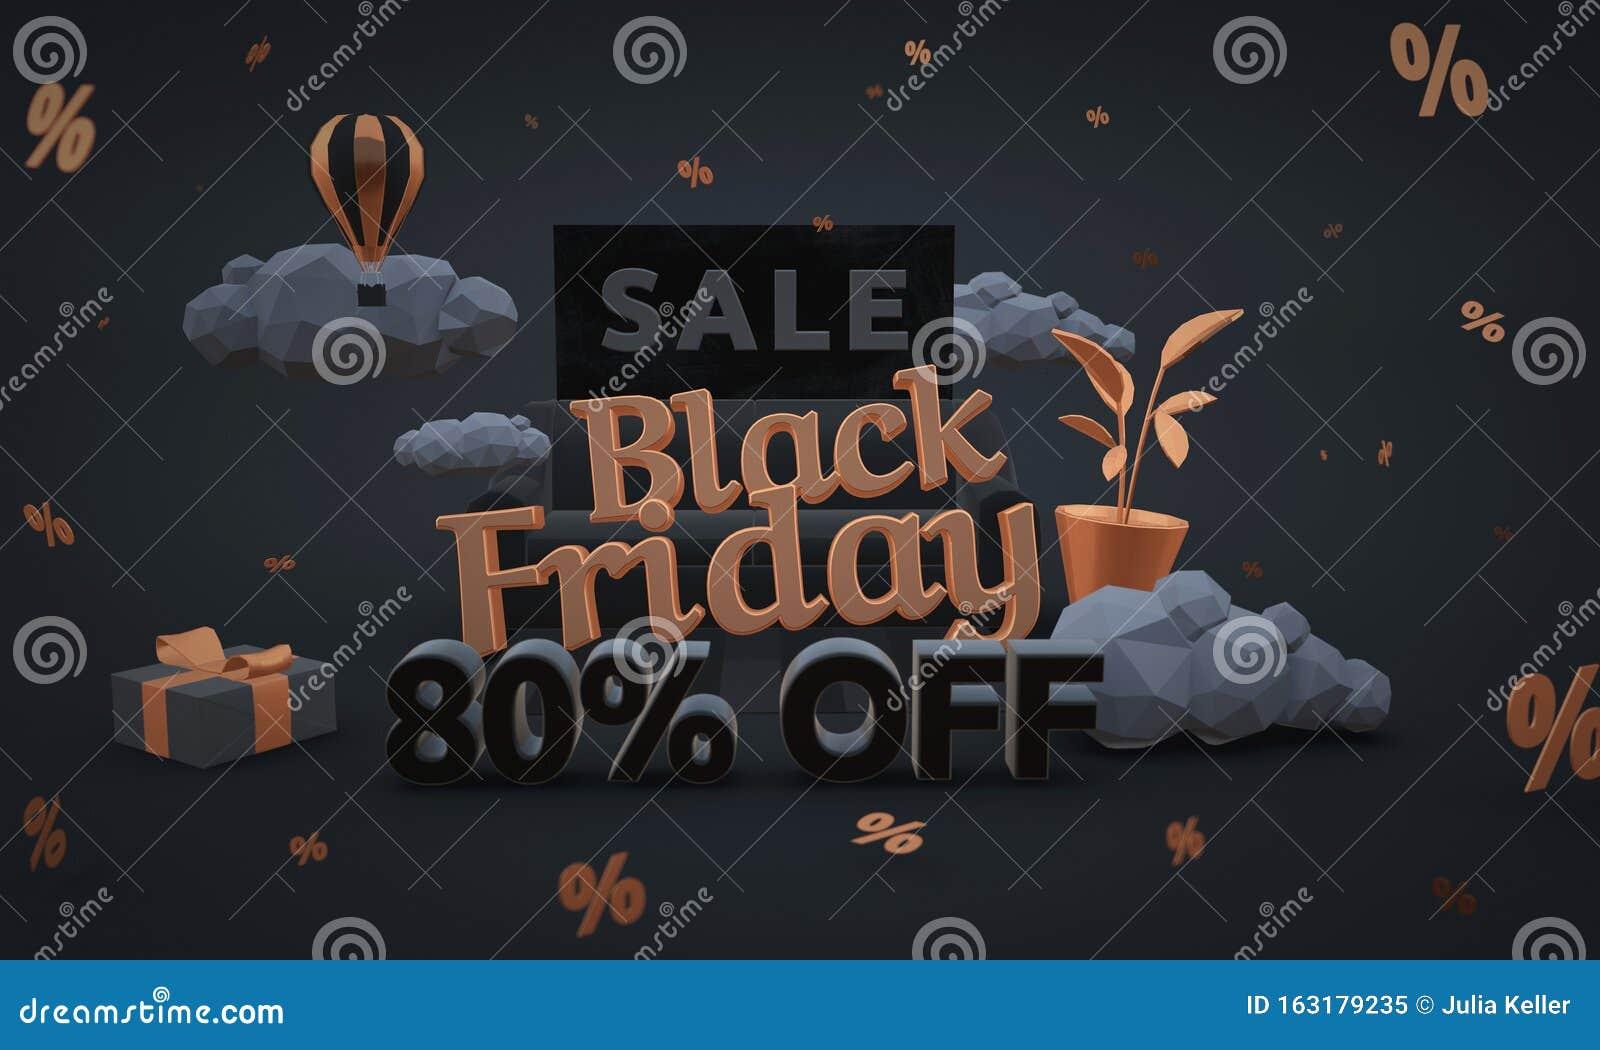 sale eighty friday black